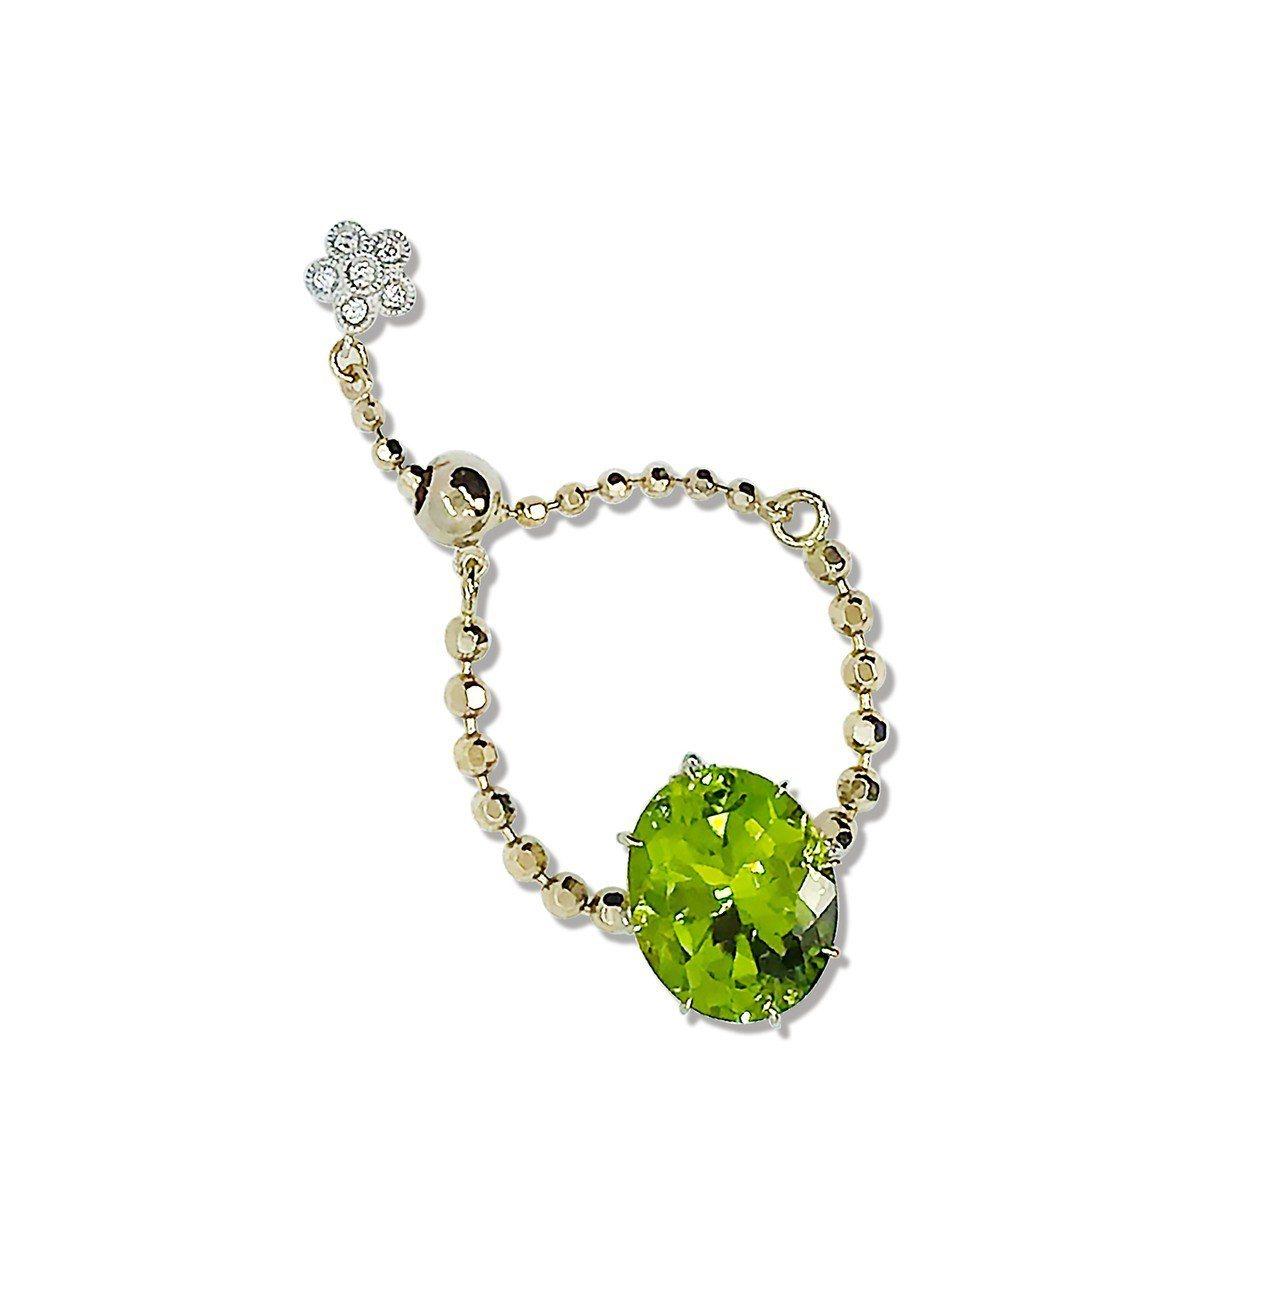 AbHerï綠橄欖石鍊戒,18萬6,000元。圖/JOYCOLORi提供